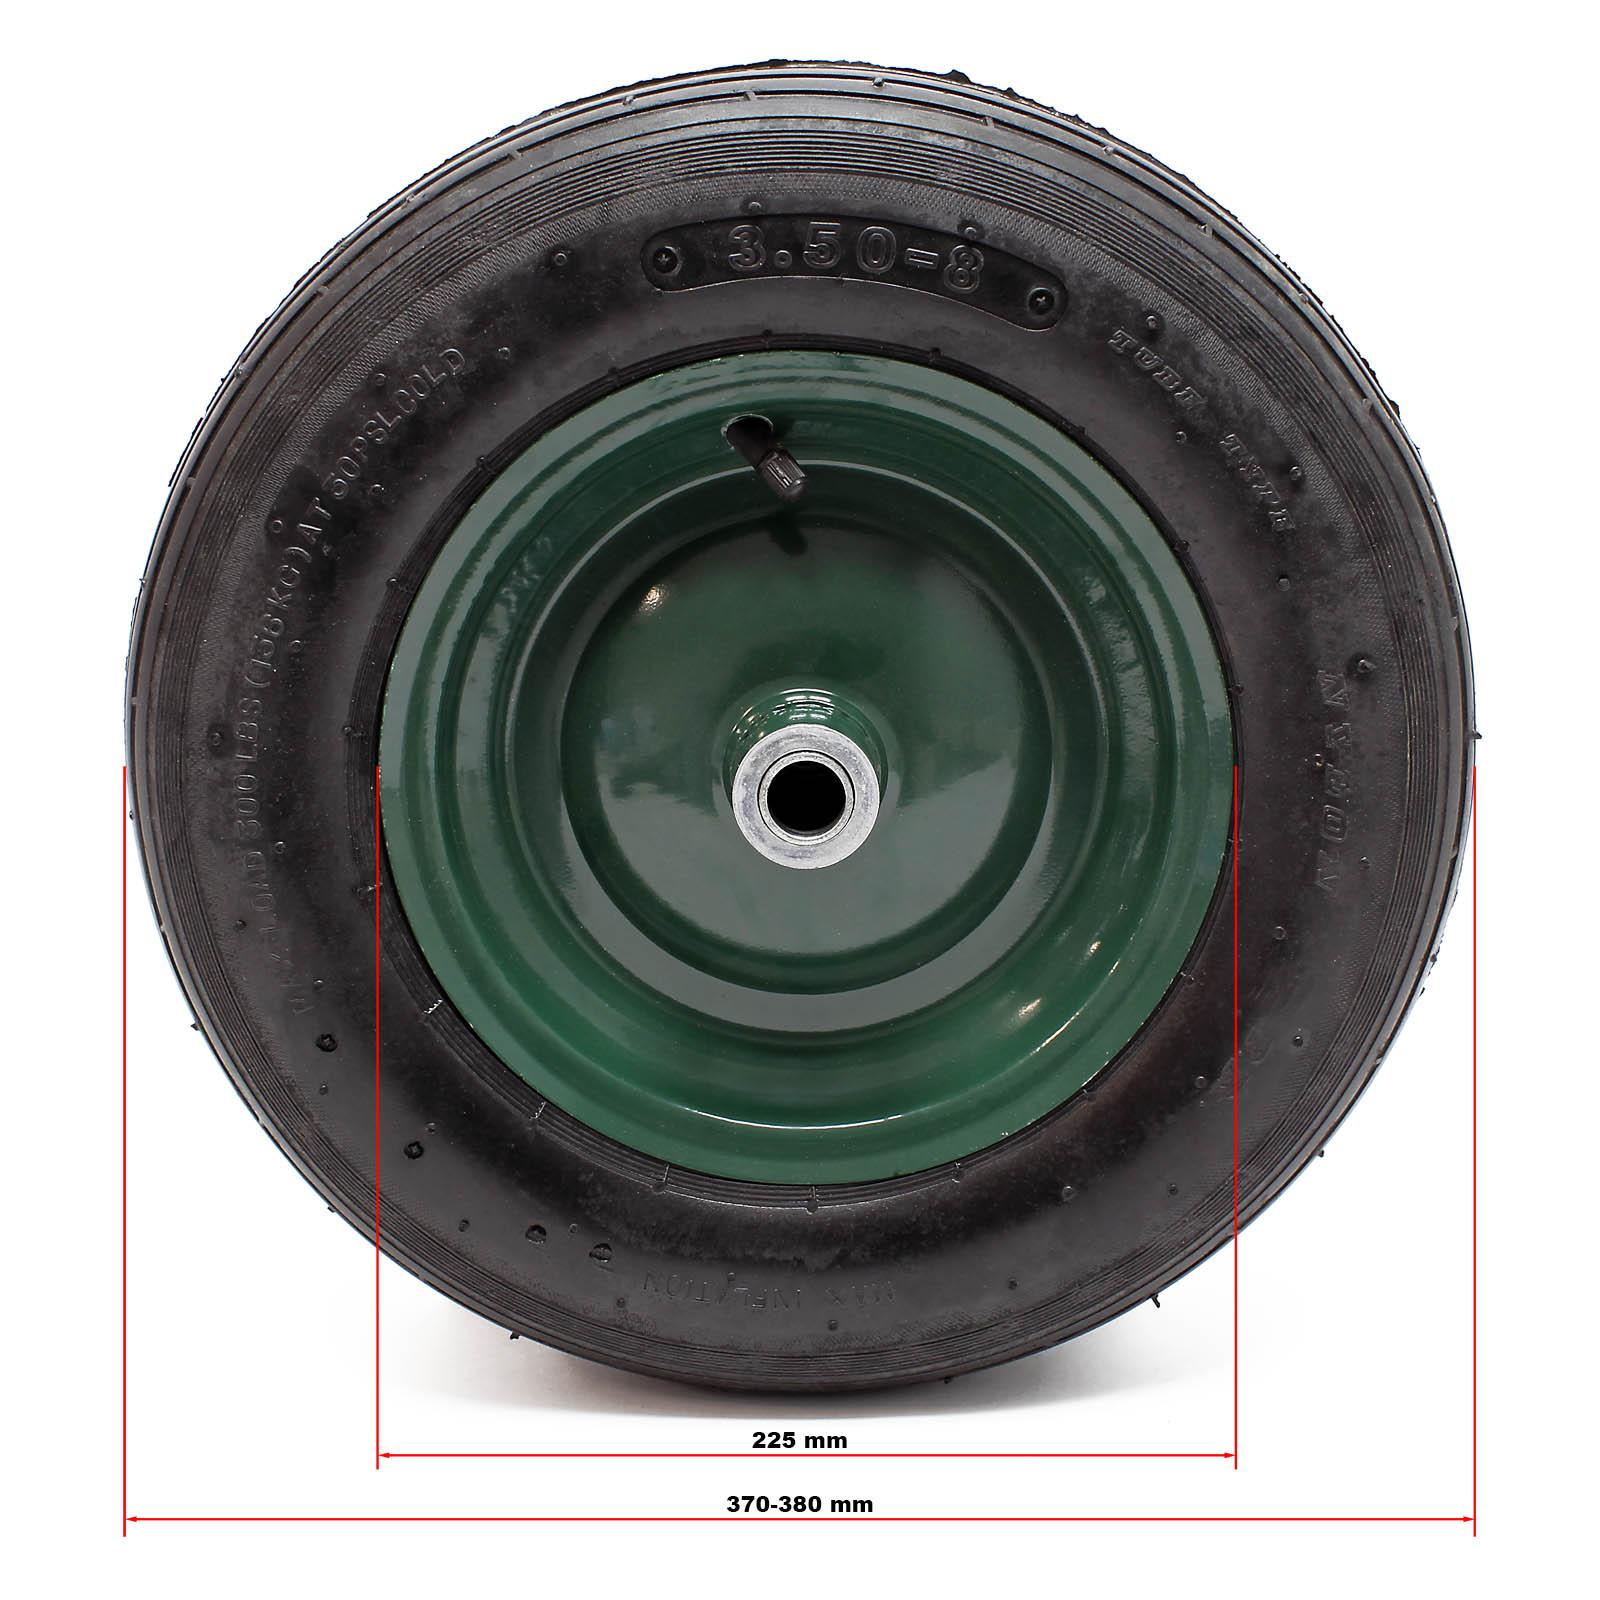 set 4 roues compl tes brouette pneu jante gonflage air pneumatique ebay. Black Bedroom Furniture Sets. Home Design Ideas